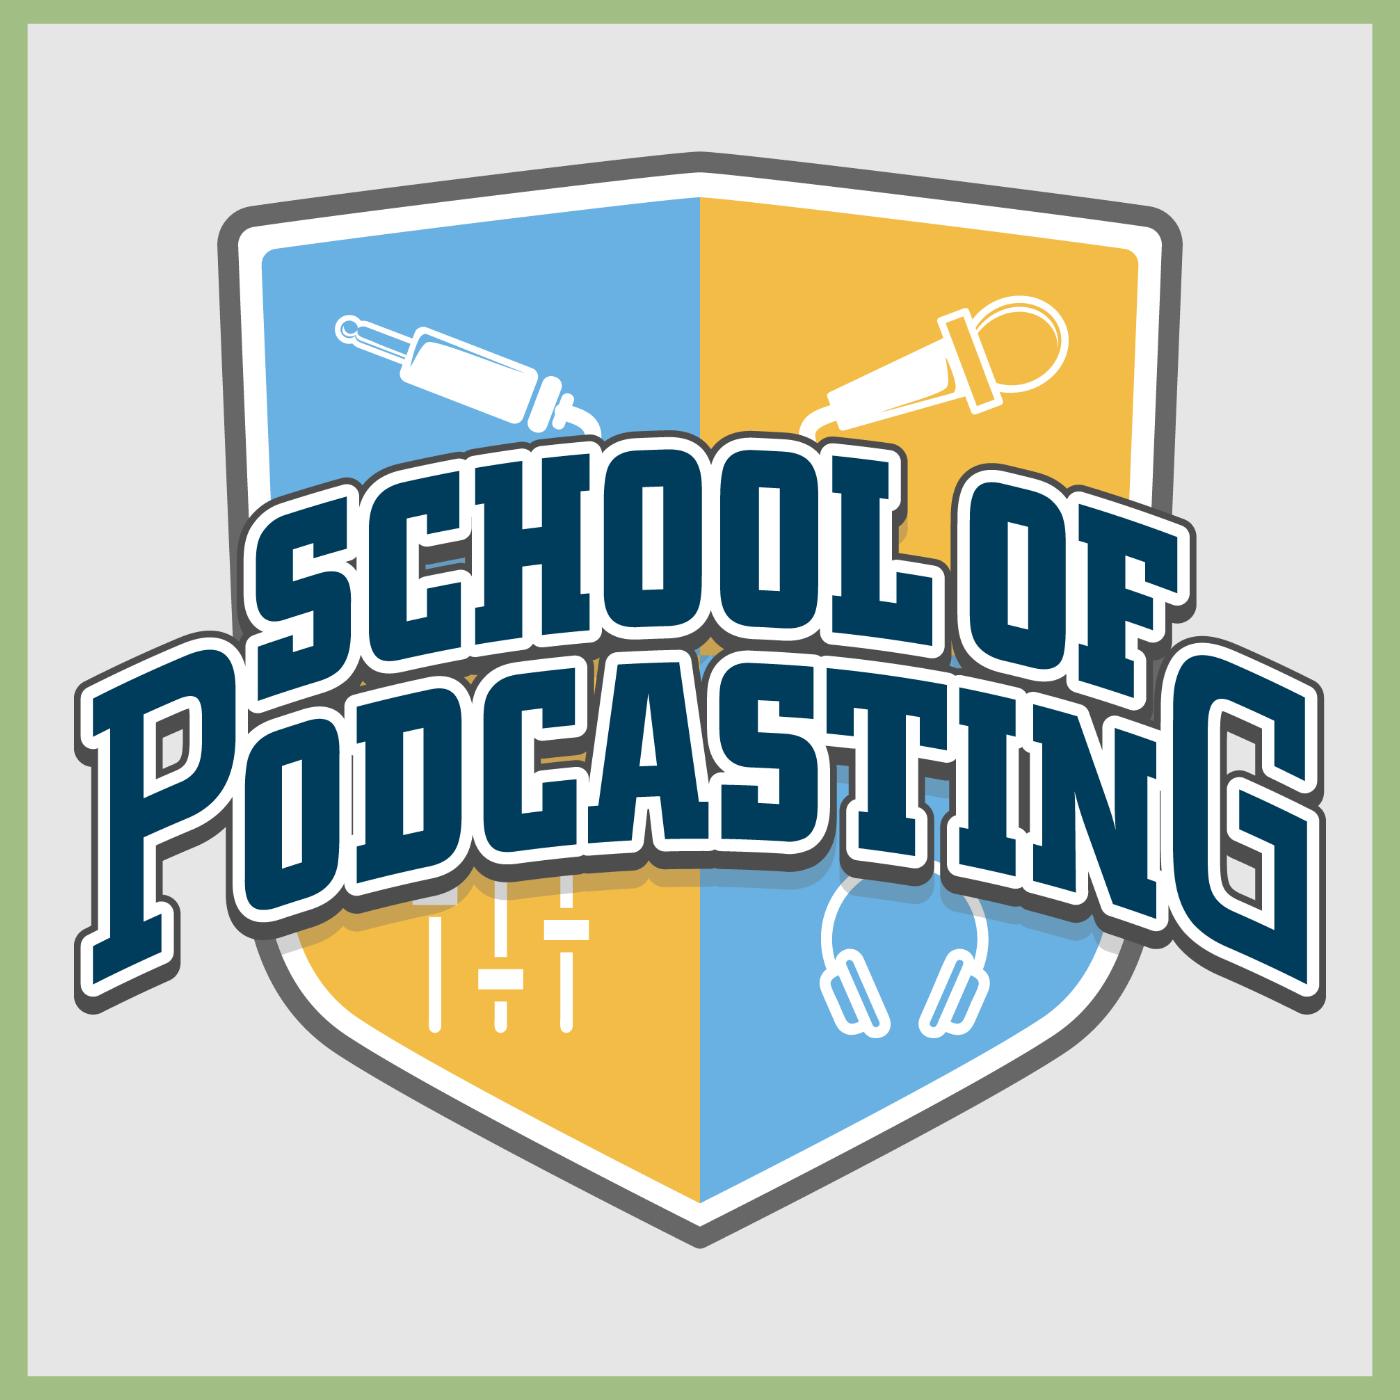 School of Podcasting cover for Viva La Flora Live Podcast